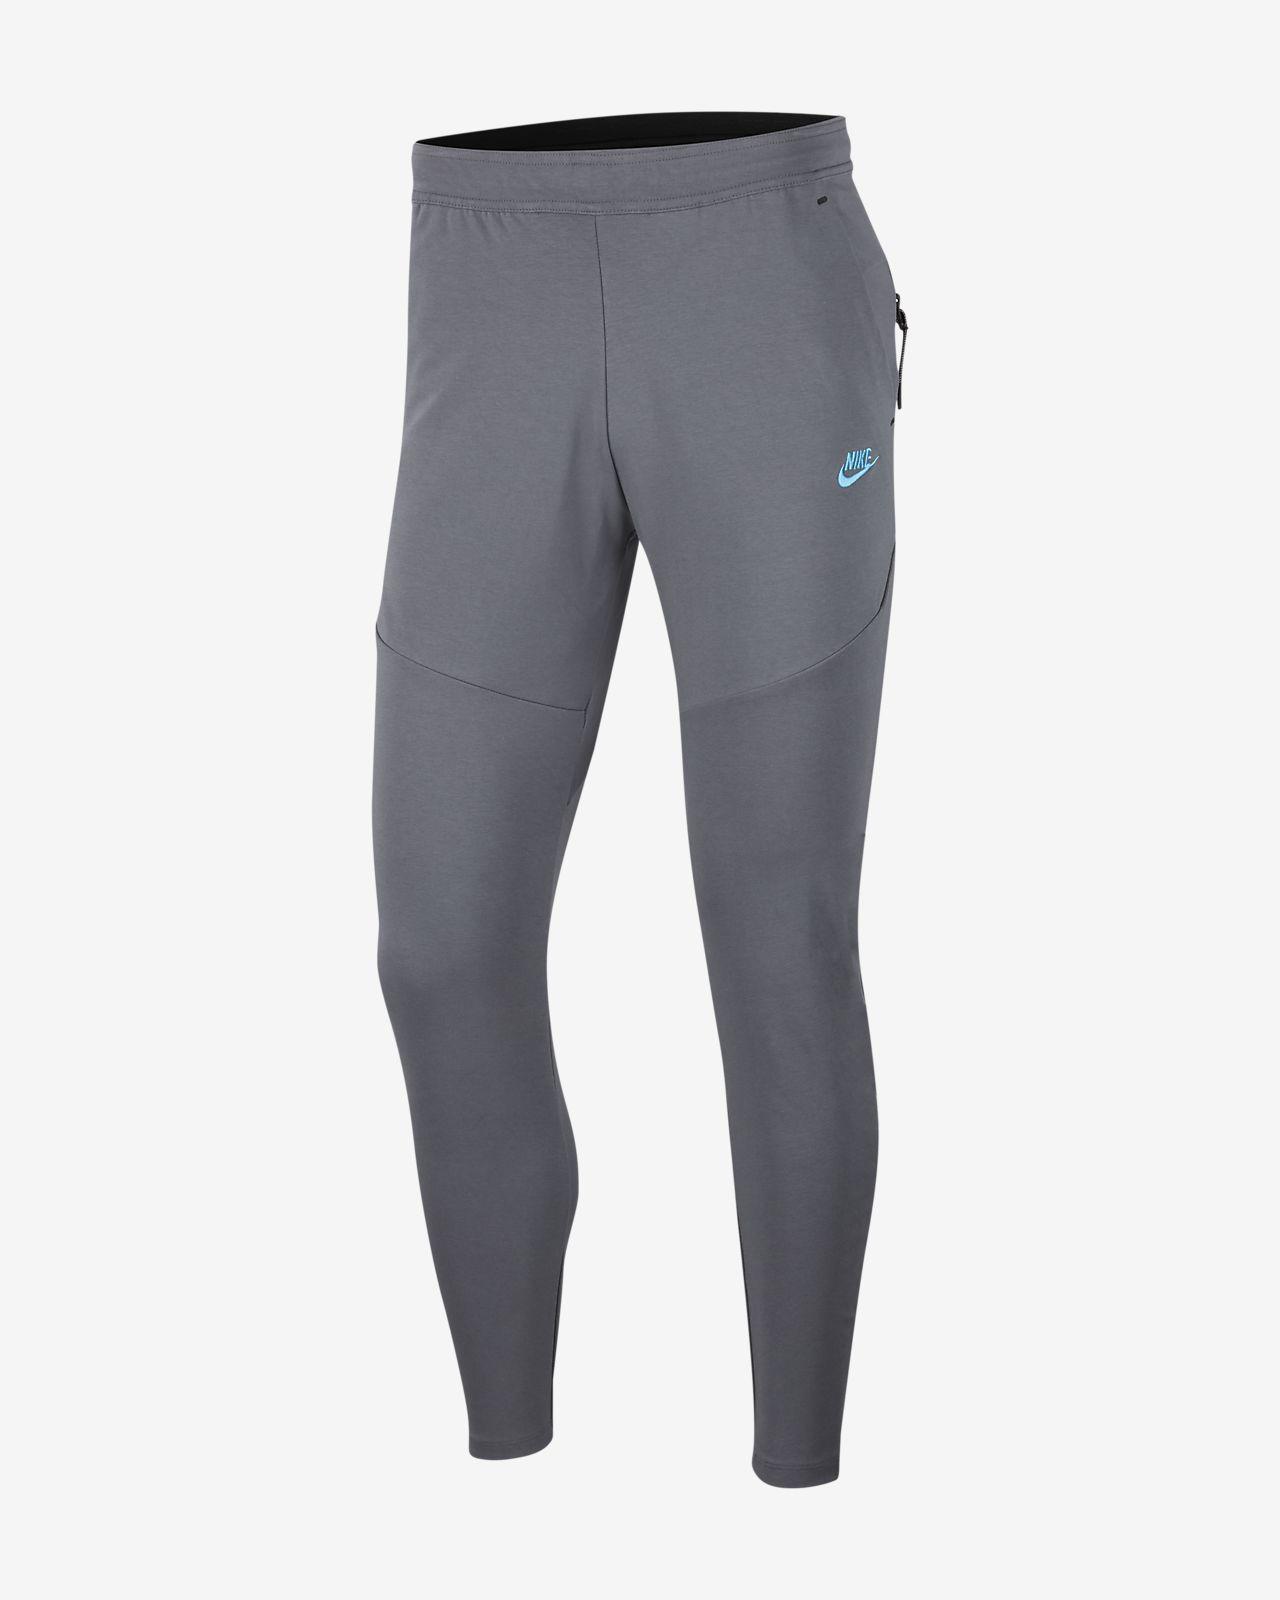 Pantalones de fútbol para hombre Tottenham Hotspur Tech Pack